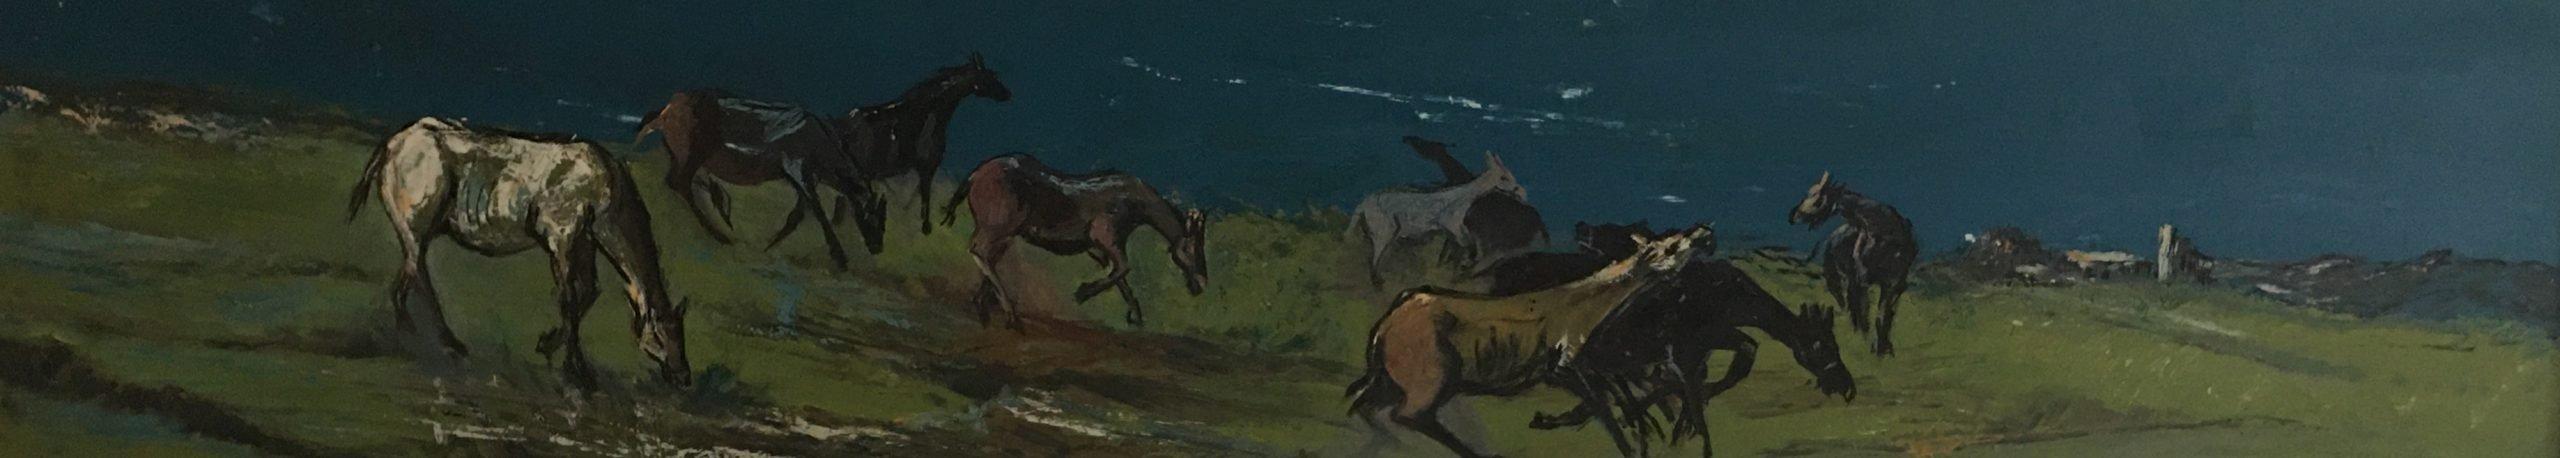 "Epifanio Irizarry: Caballos (undated)Oil on canvas 58"" x 11"""